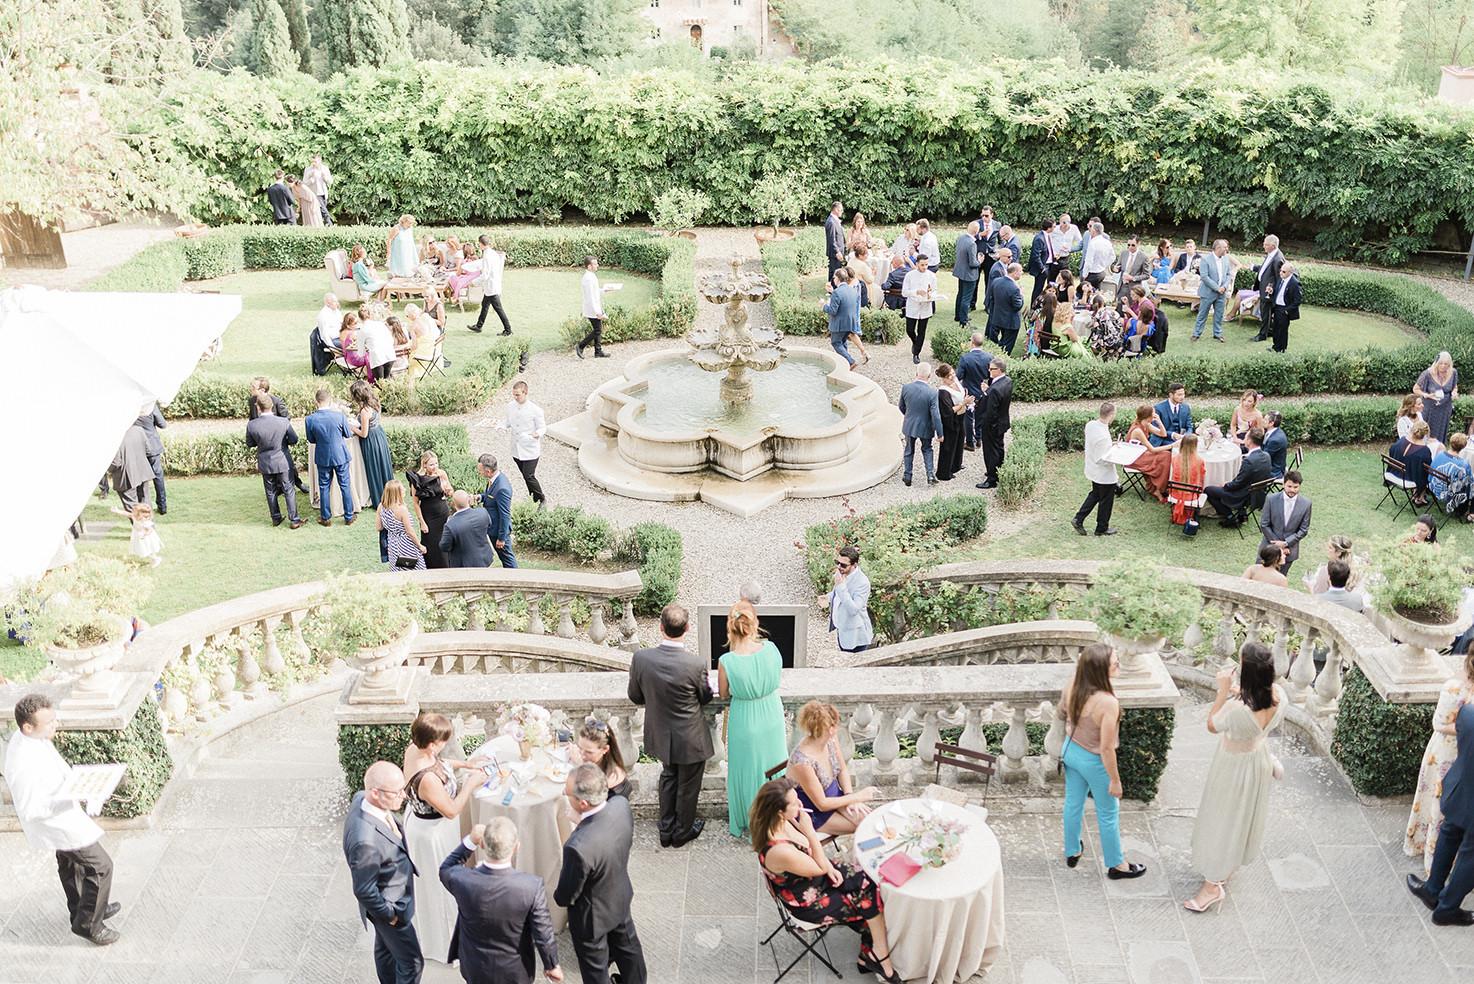 Aperitif for Italian wedding